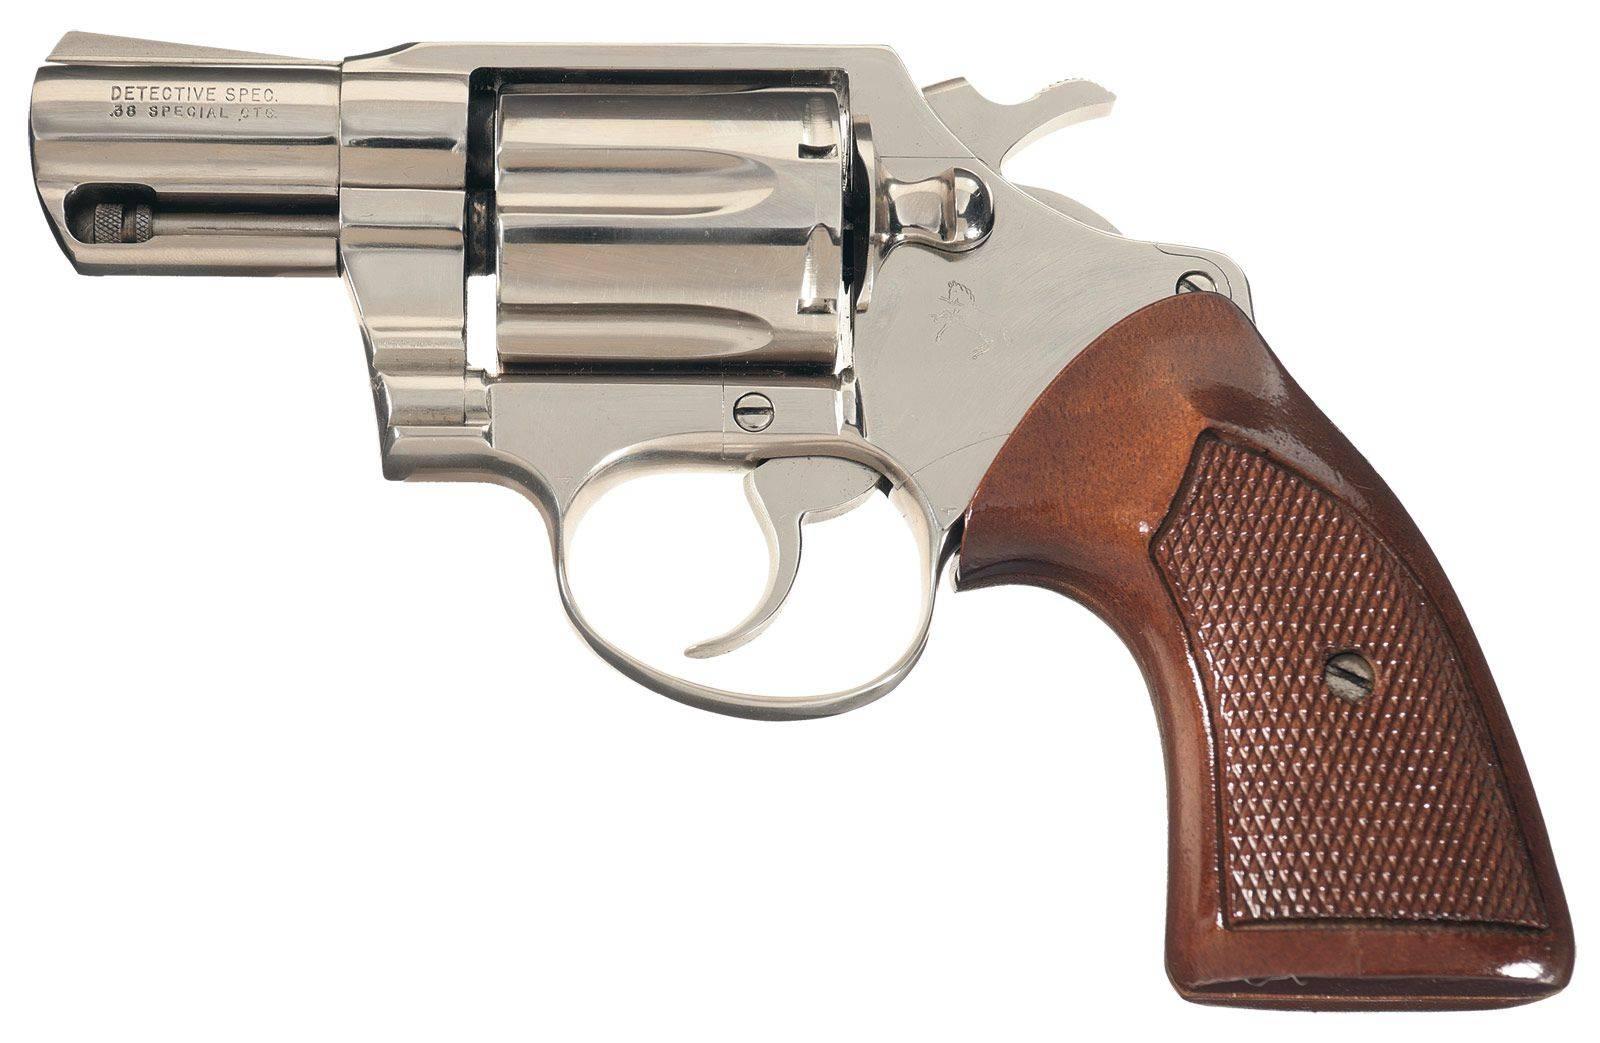 Colt detective special - револьвер в стиле нуар